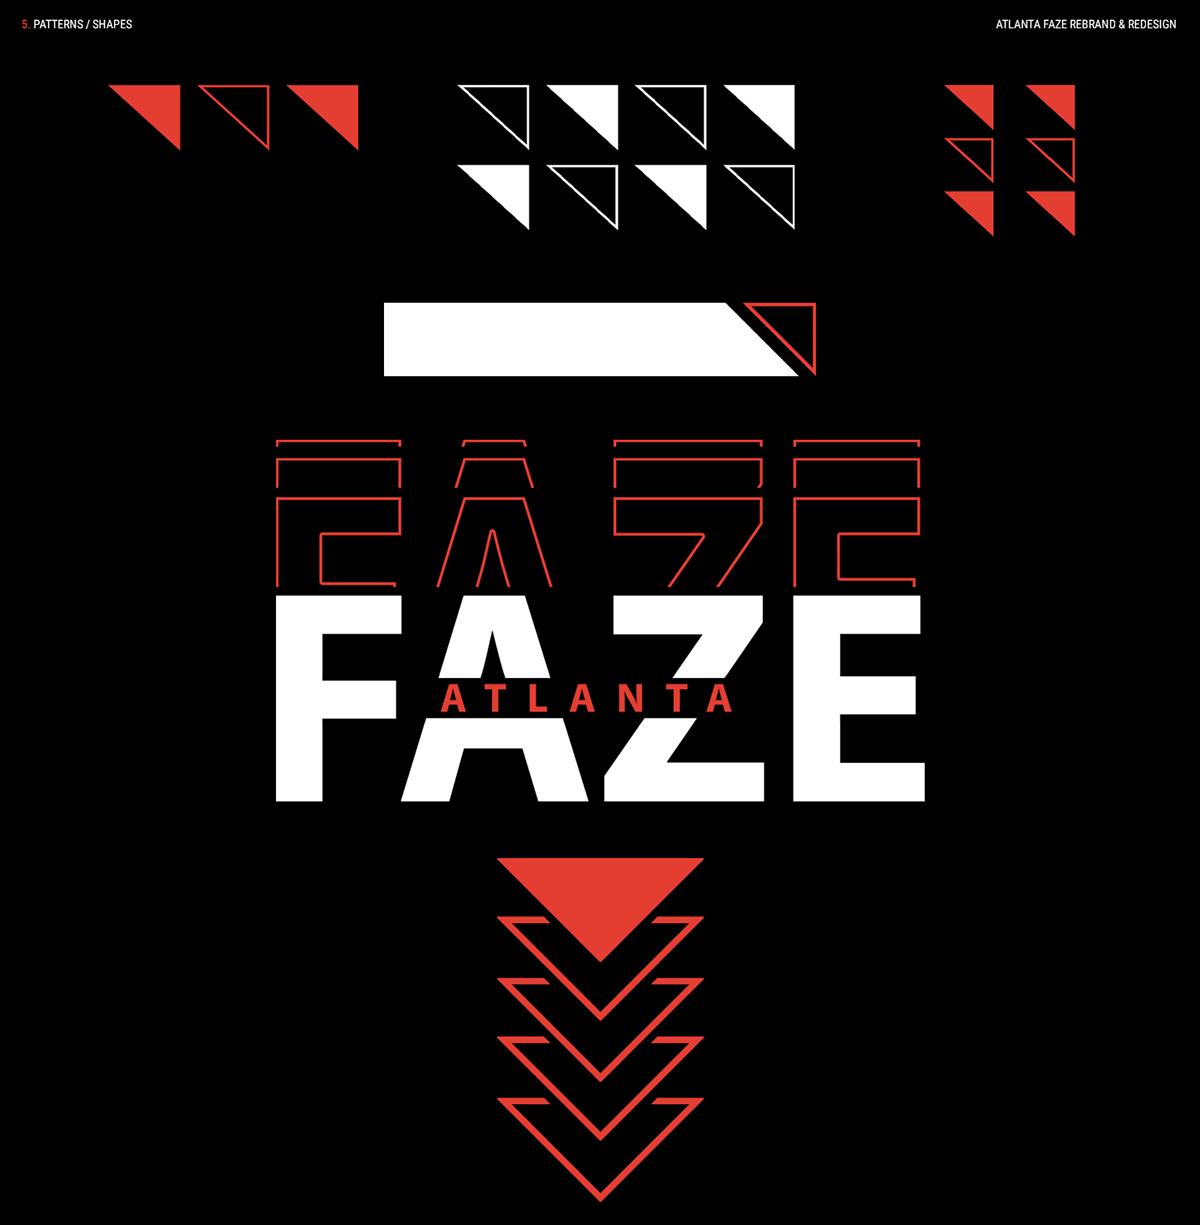 Atlanta Faze Rebrand Redesign On Behance Rebranding Faze Logo Redesign